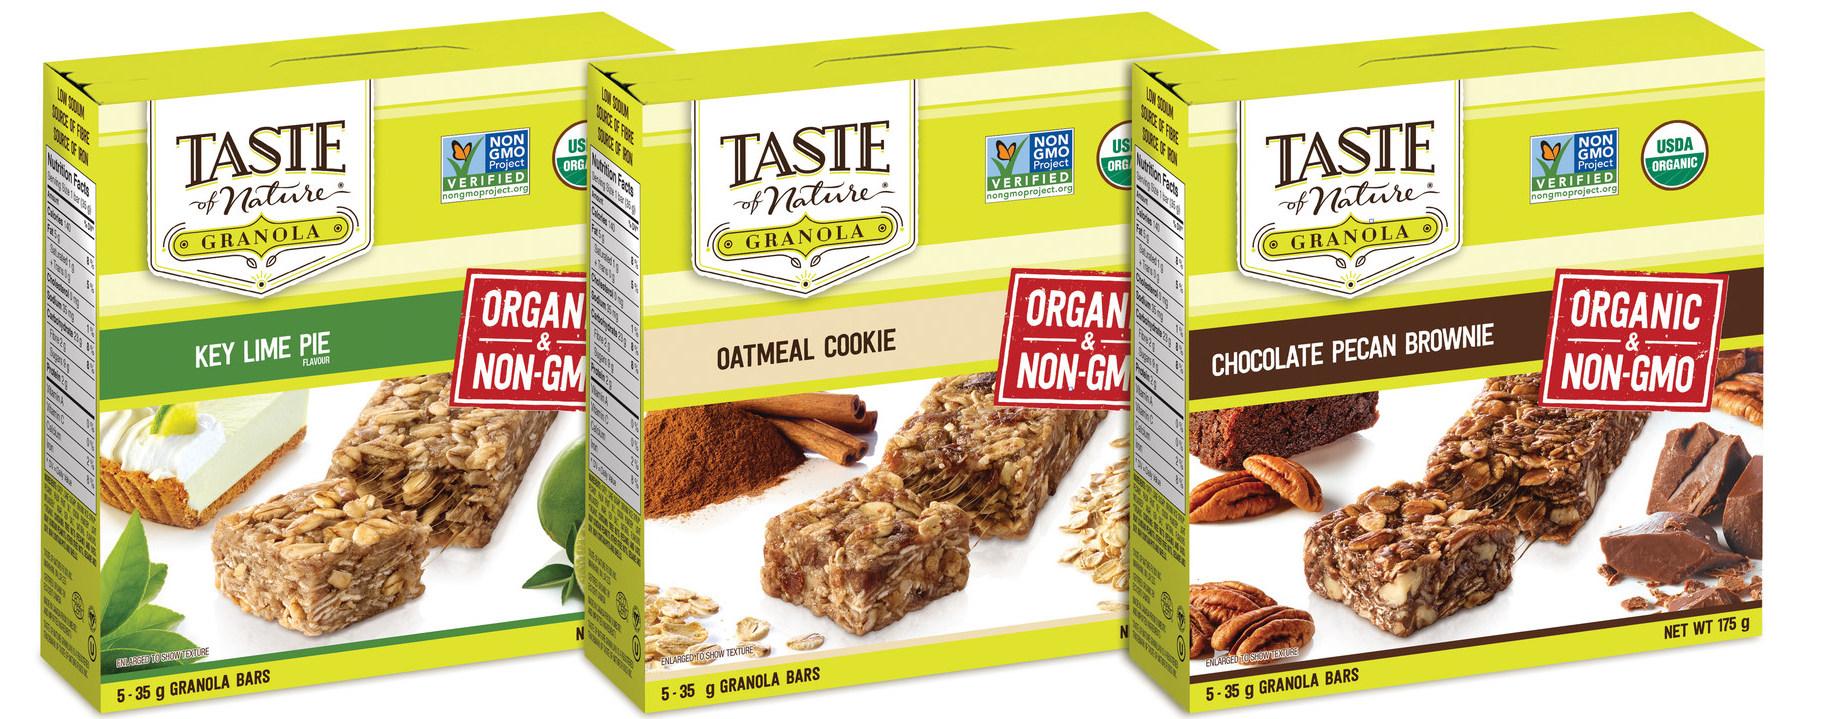 New Taste of Nature Granola